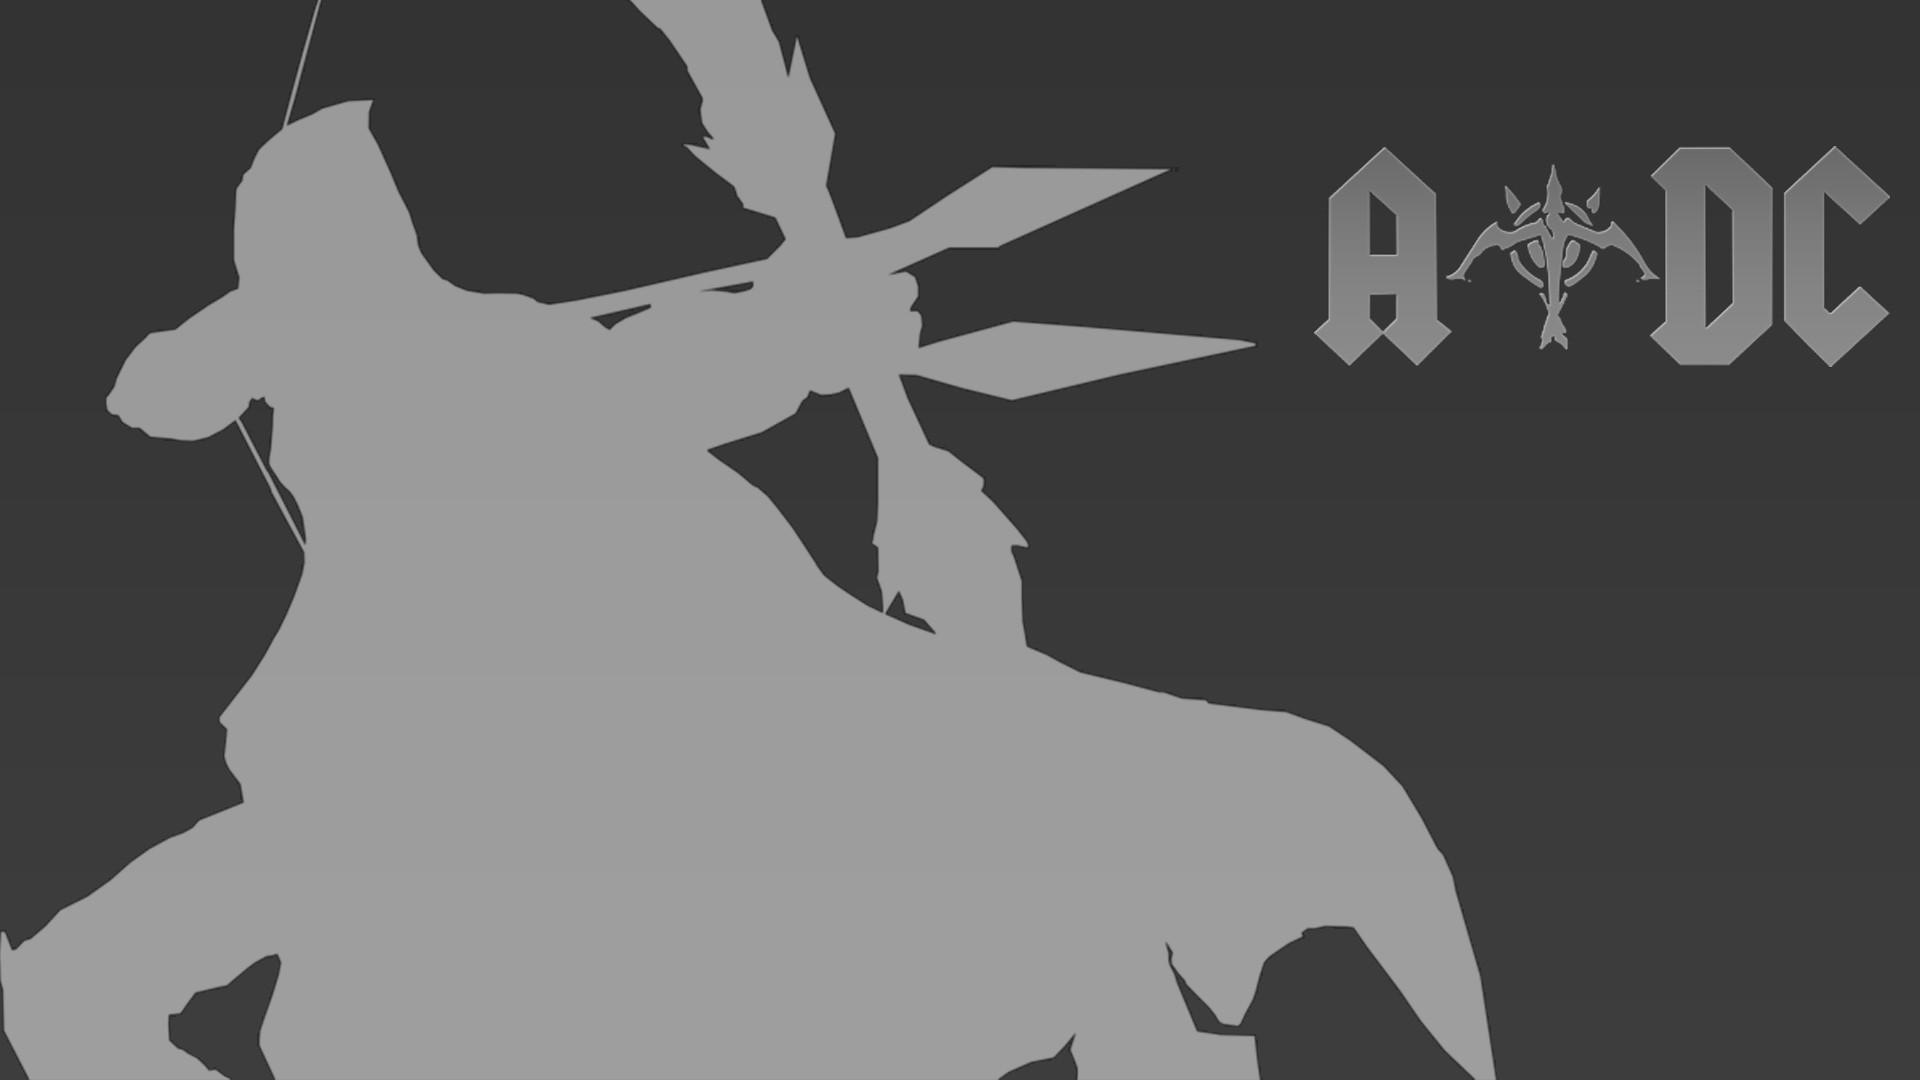 … League Of Legends ADC Marksman Wallpaper [FREE DW] by TonyKGFX